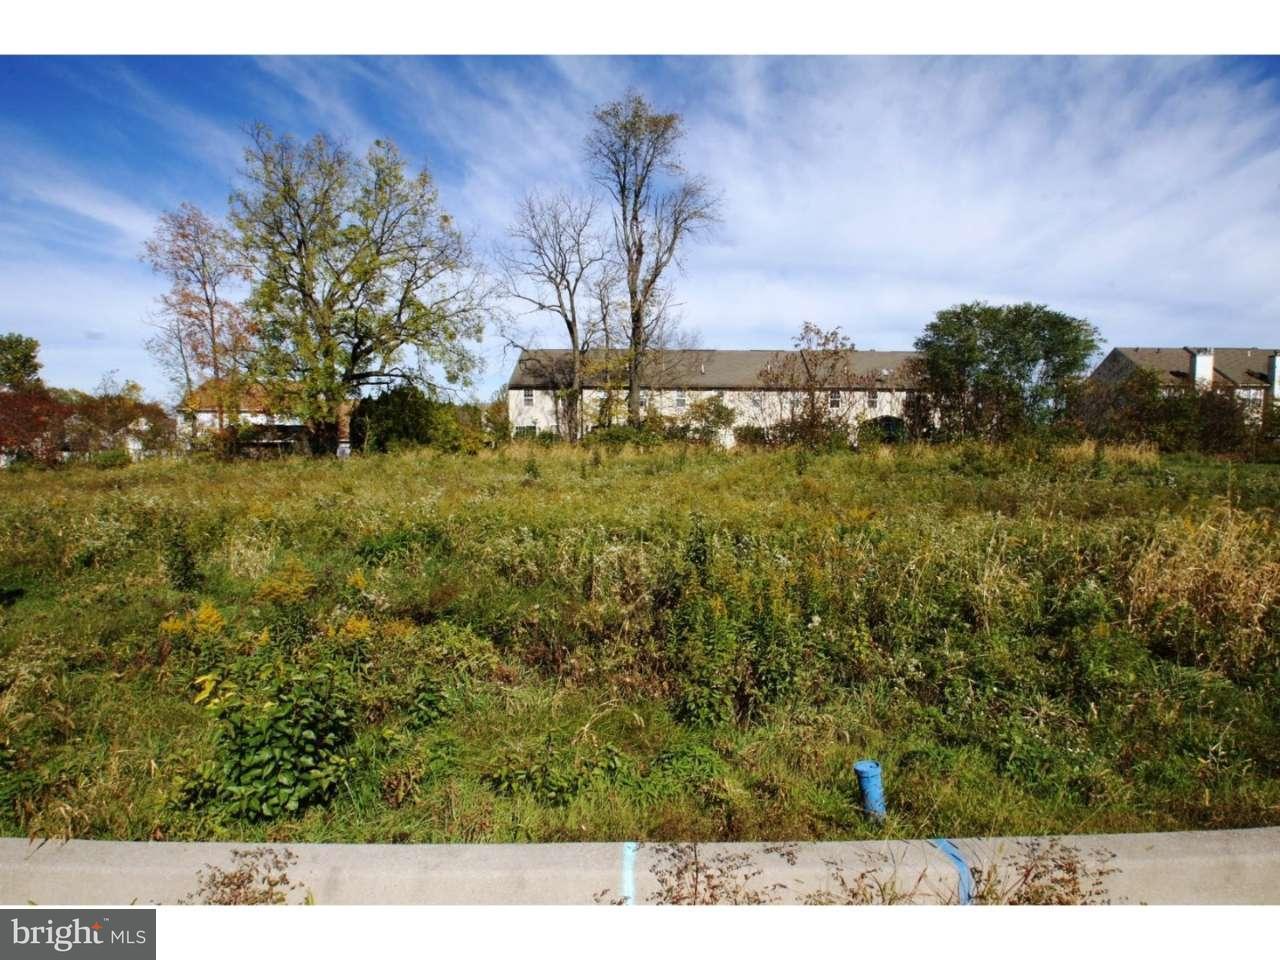 Single Family Home for Sale at ,000 SOFIA BLVD Blandon, Pennsylvania 19510 United States